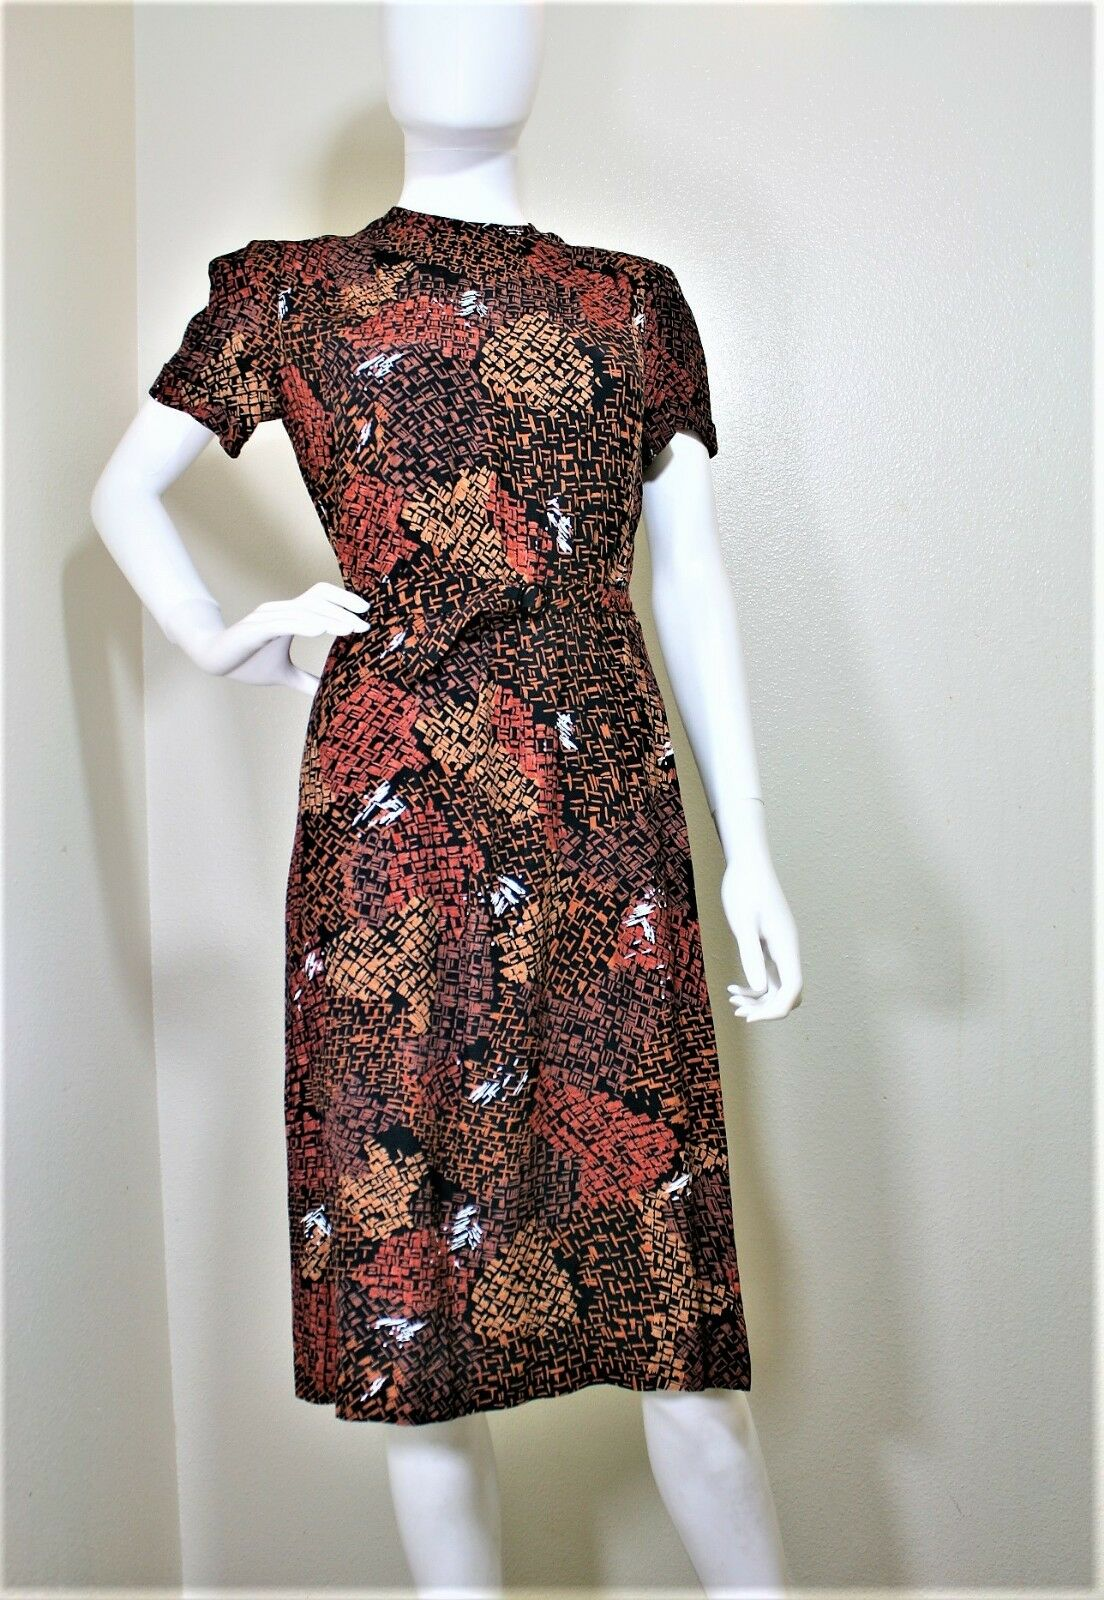 VINTAGE TAURUS II BELTED DRESS SHORT SLEEVE 40S STYLE DAY DRESS 4